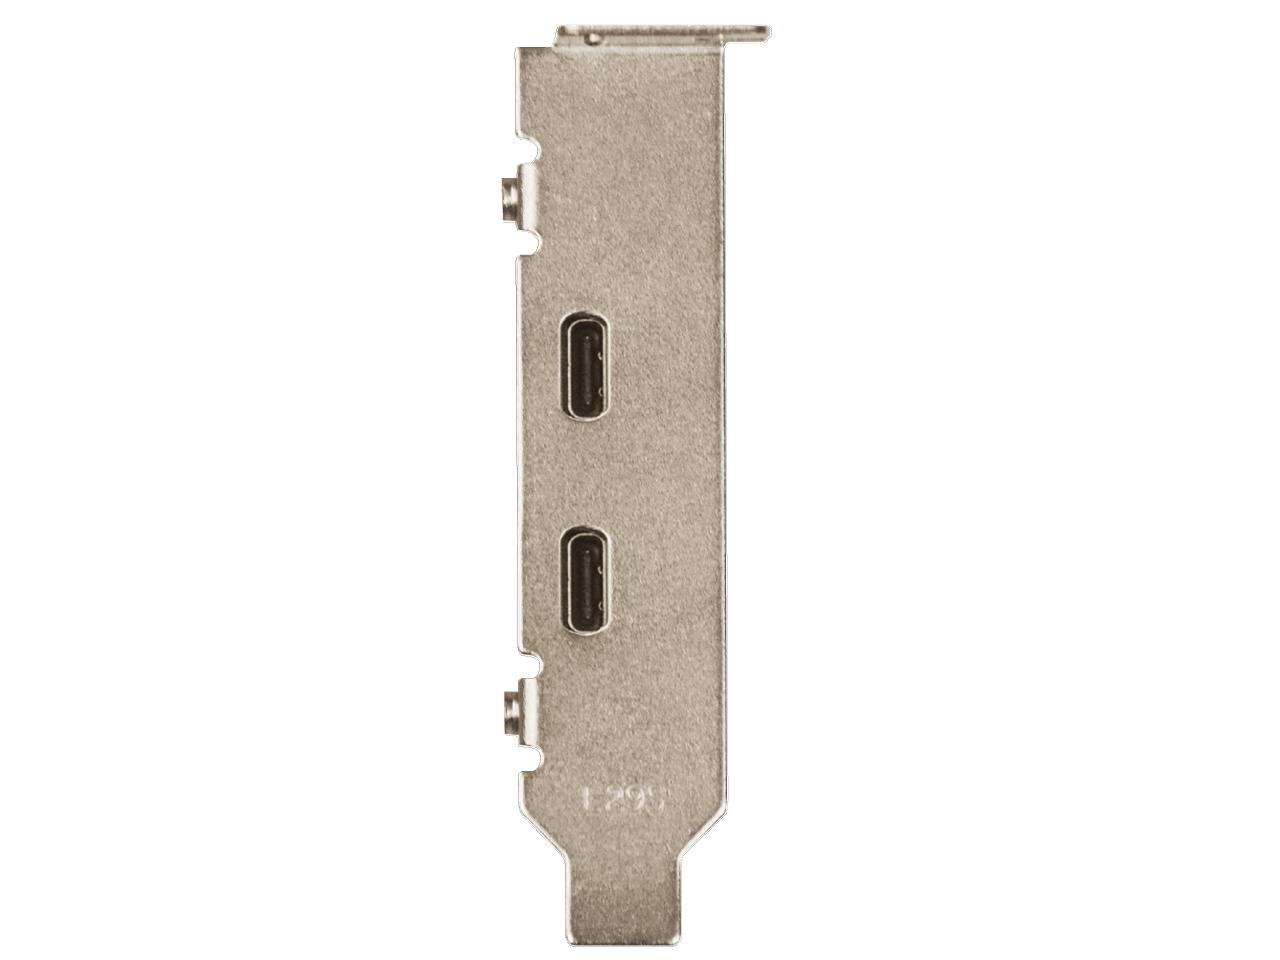 『本体 接続部分1』 USB3.1C-P2-PCIE [USB3.1] の製品画像